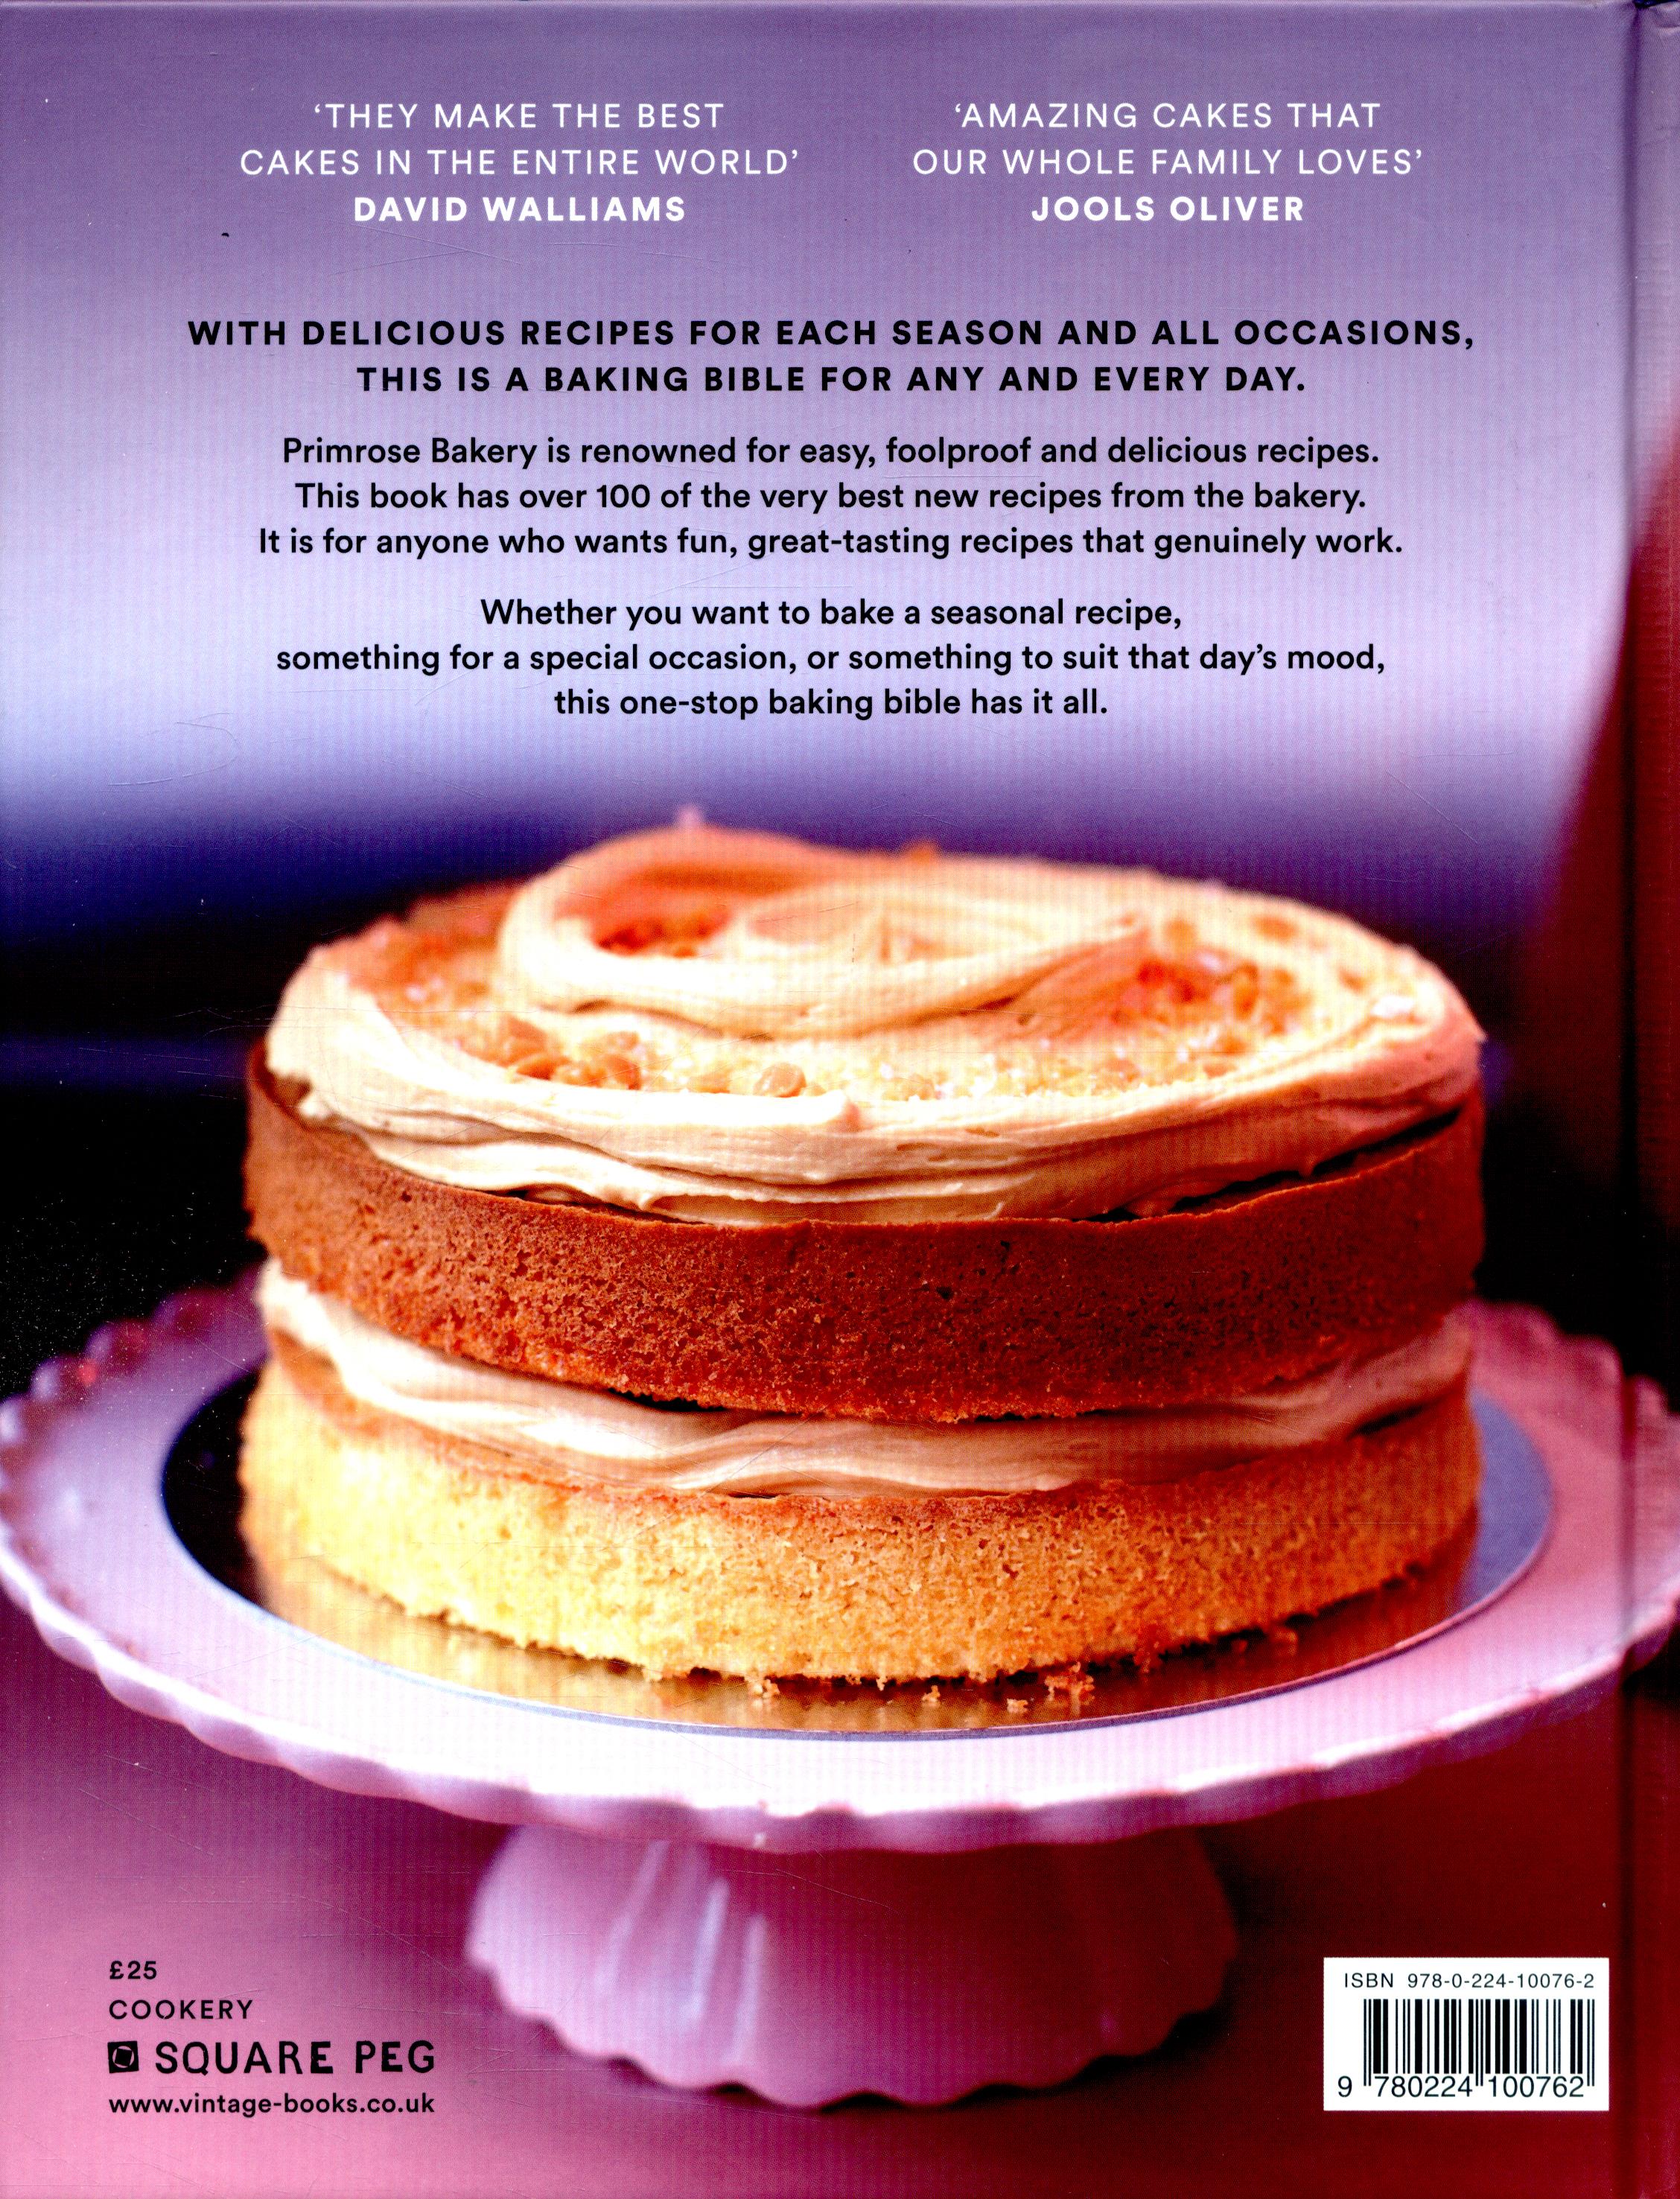 the primrose bakery book